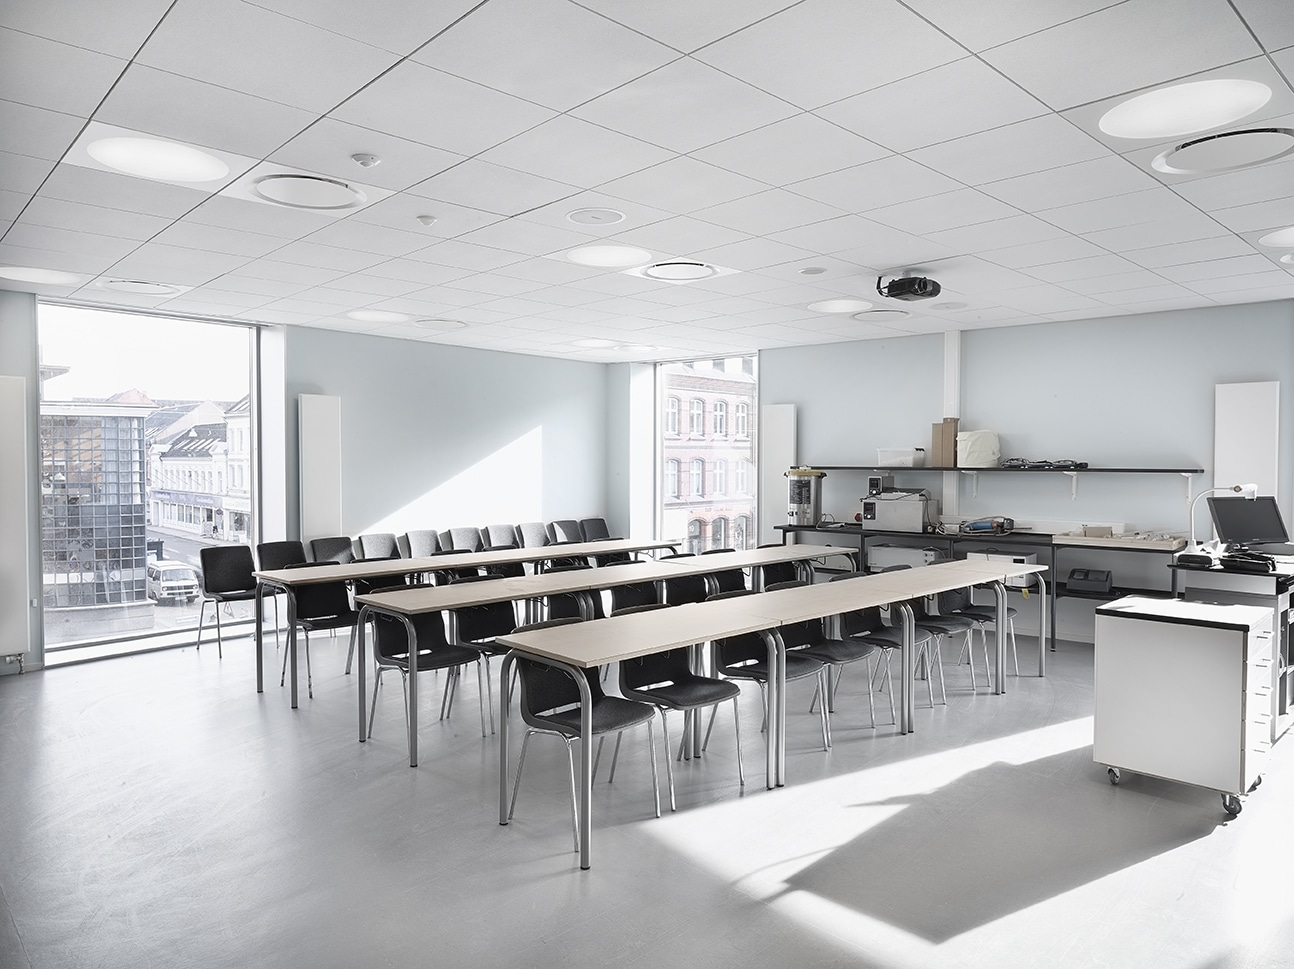 Ledgo circle panel lampe monteret i gips loft i klasselokale hos Odense Katedralskole - Luminex